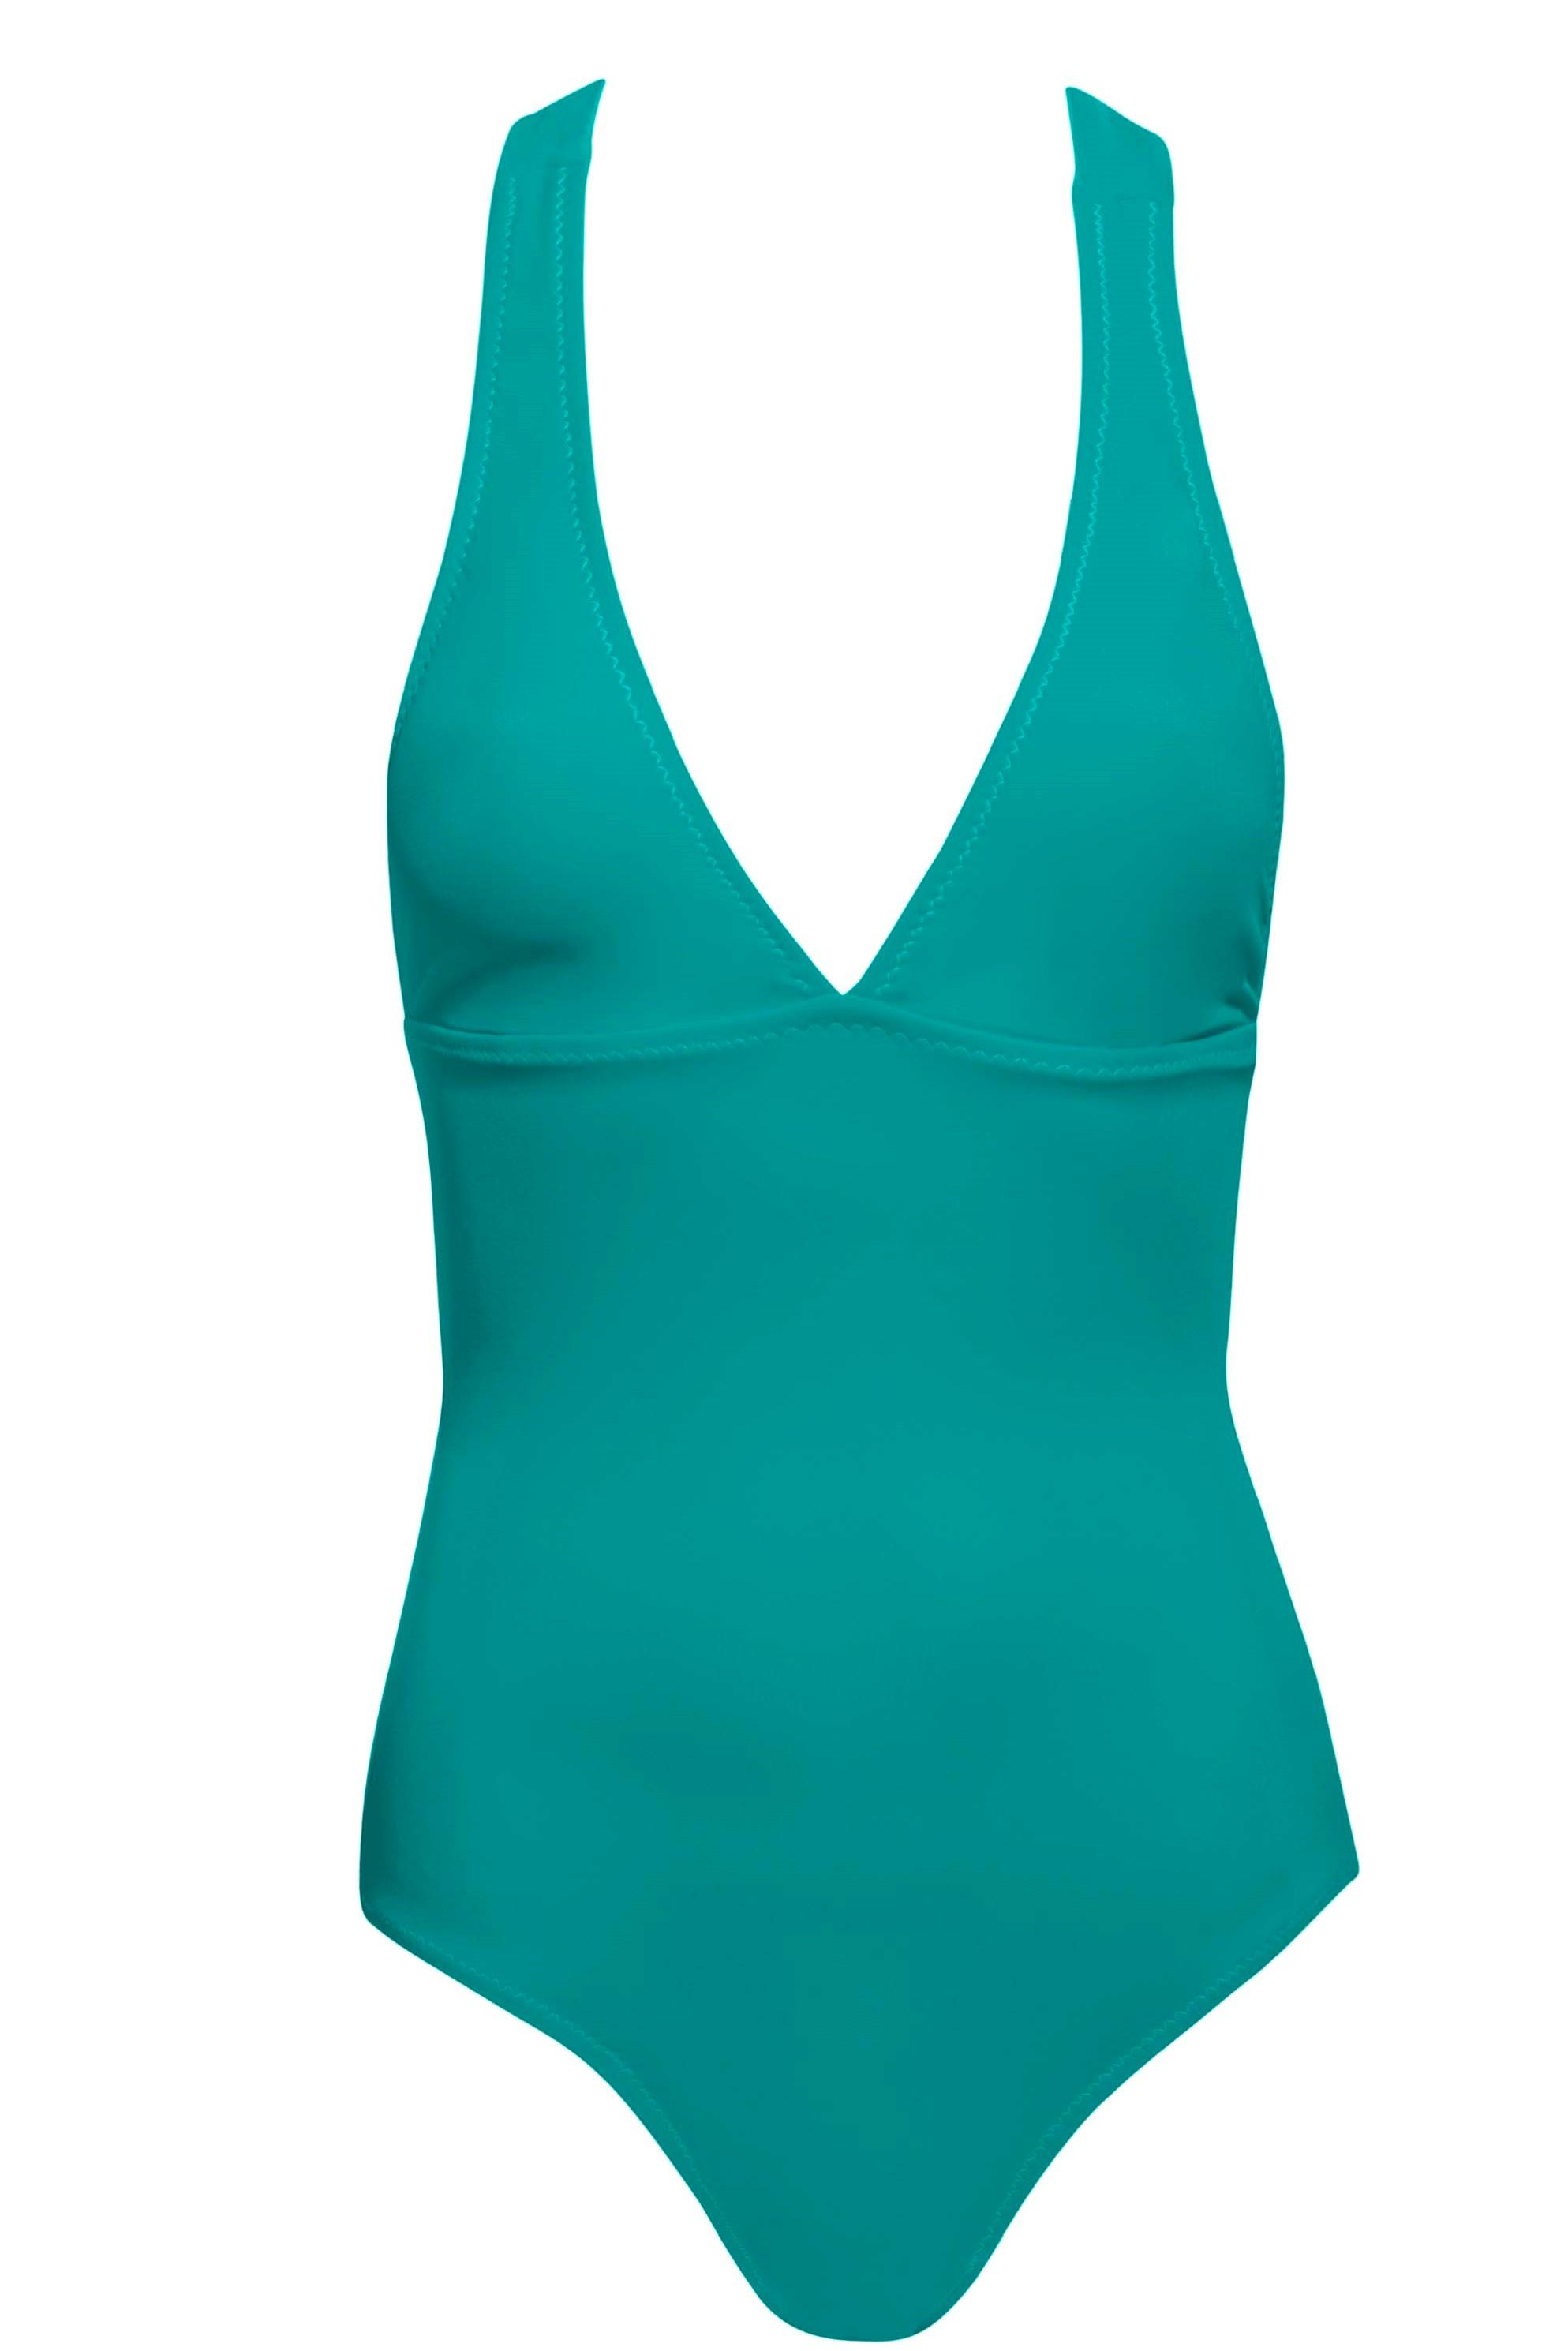 Phax Color Mix Badpak Jade-small-Jade Groen